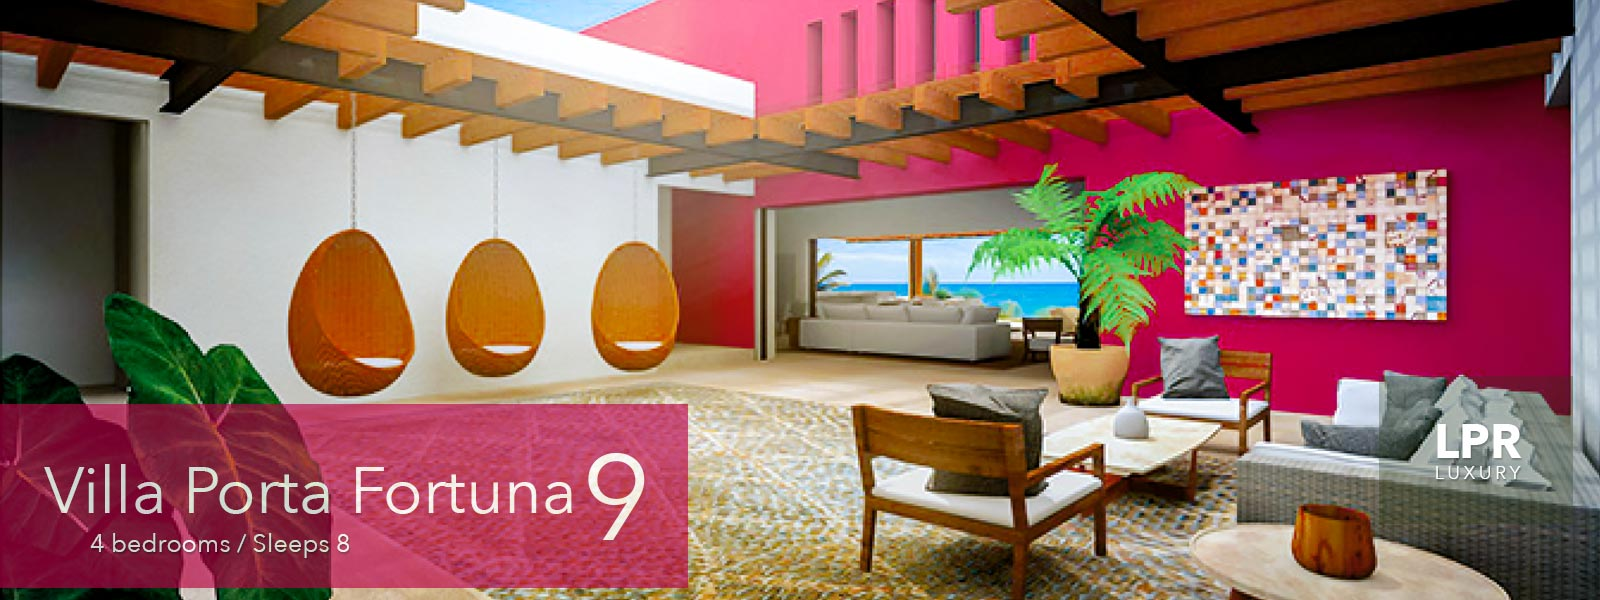 Villa Porta Fortuna 9 - Luxury oceanfront real estate for sale at the Punta Mita Resort, Riviera Nayarit, Mexico